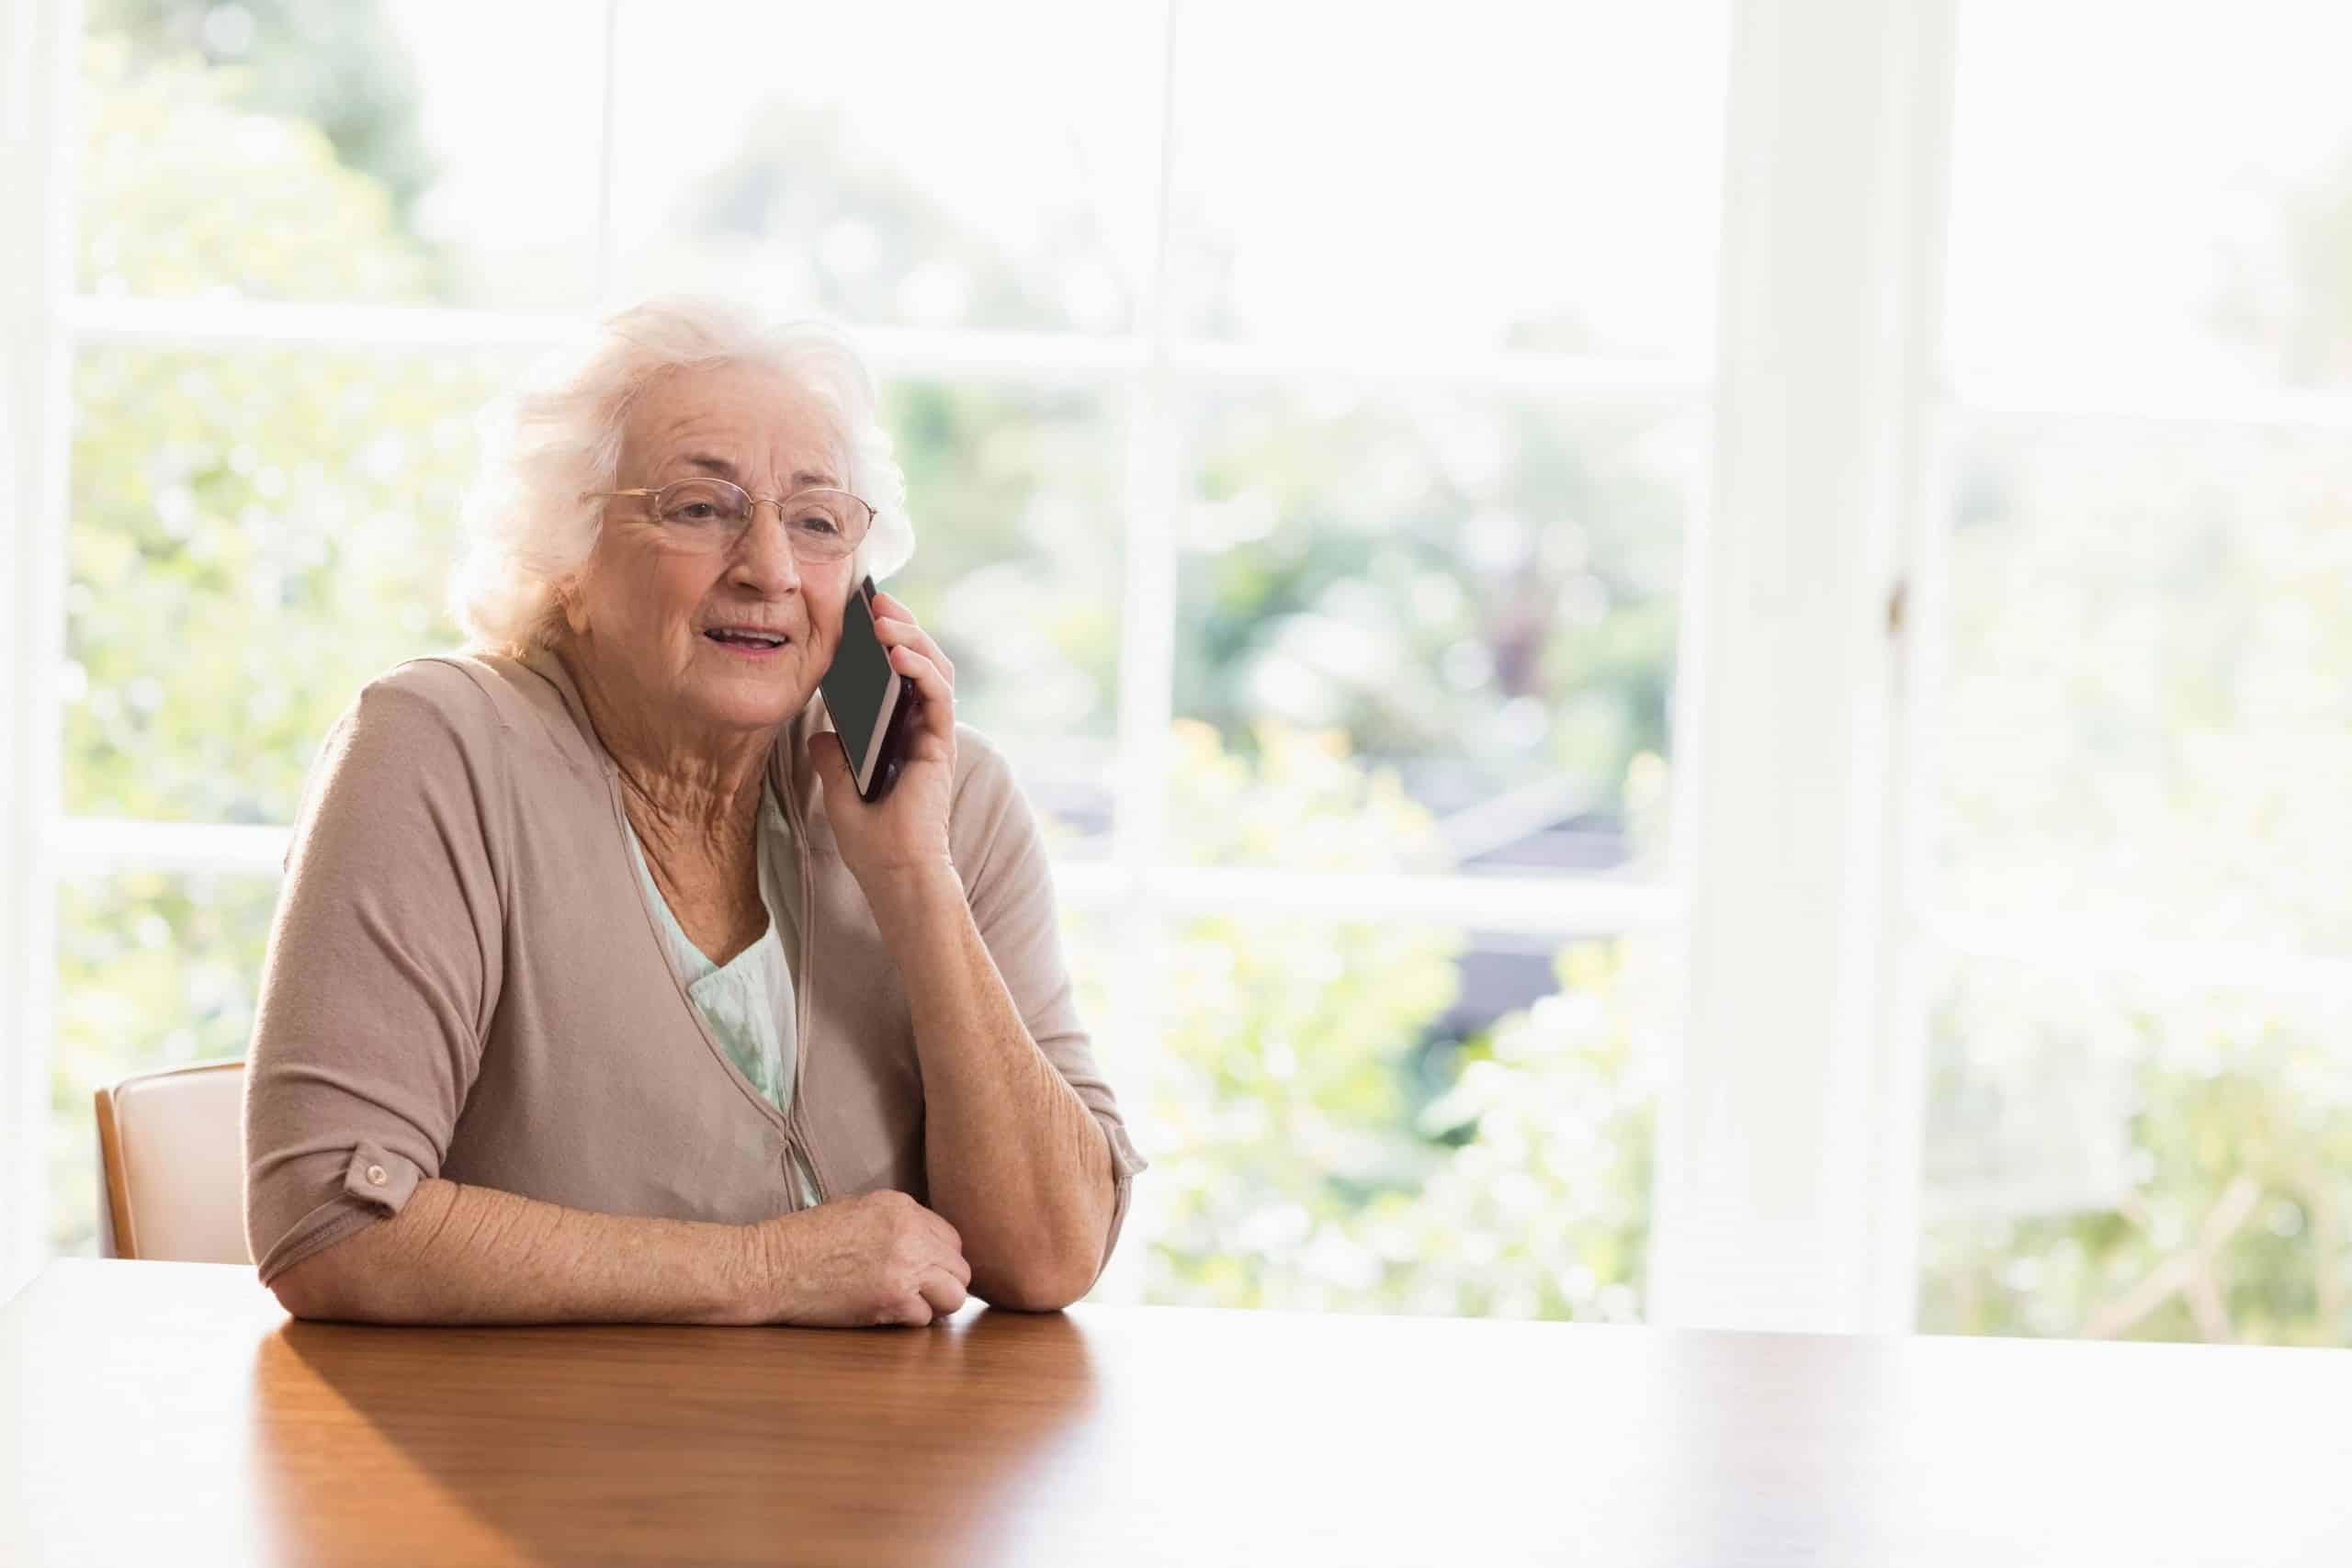 Elderly Lay on the phone